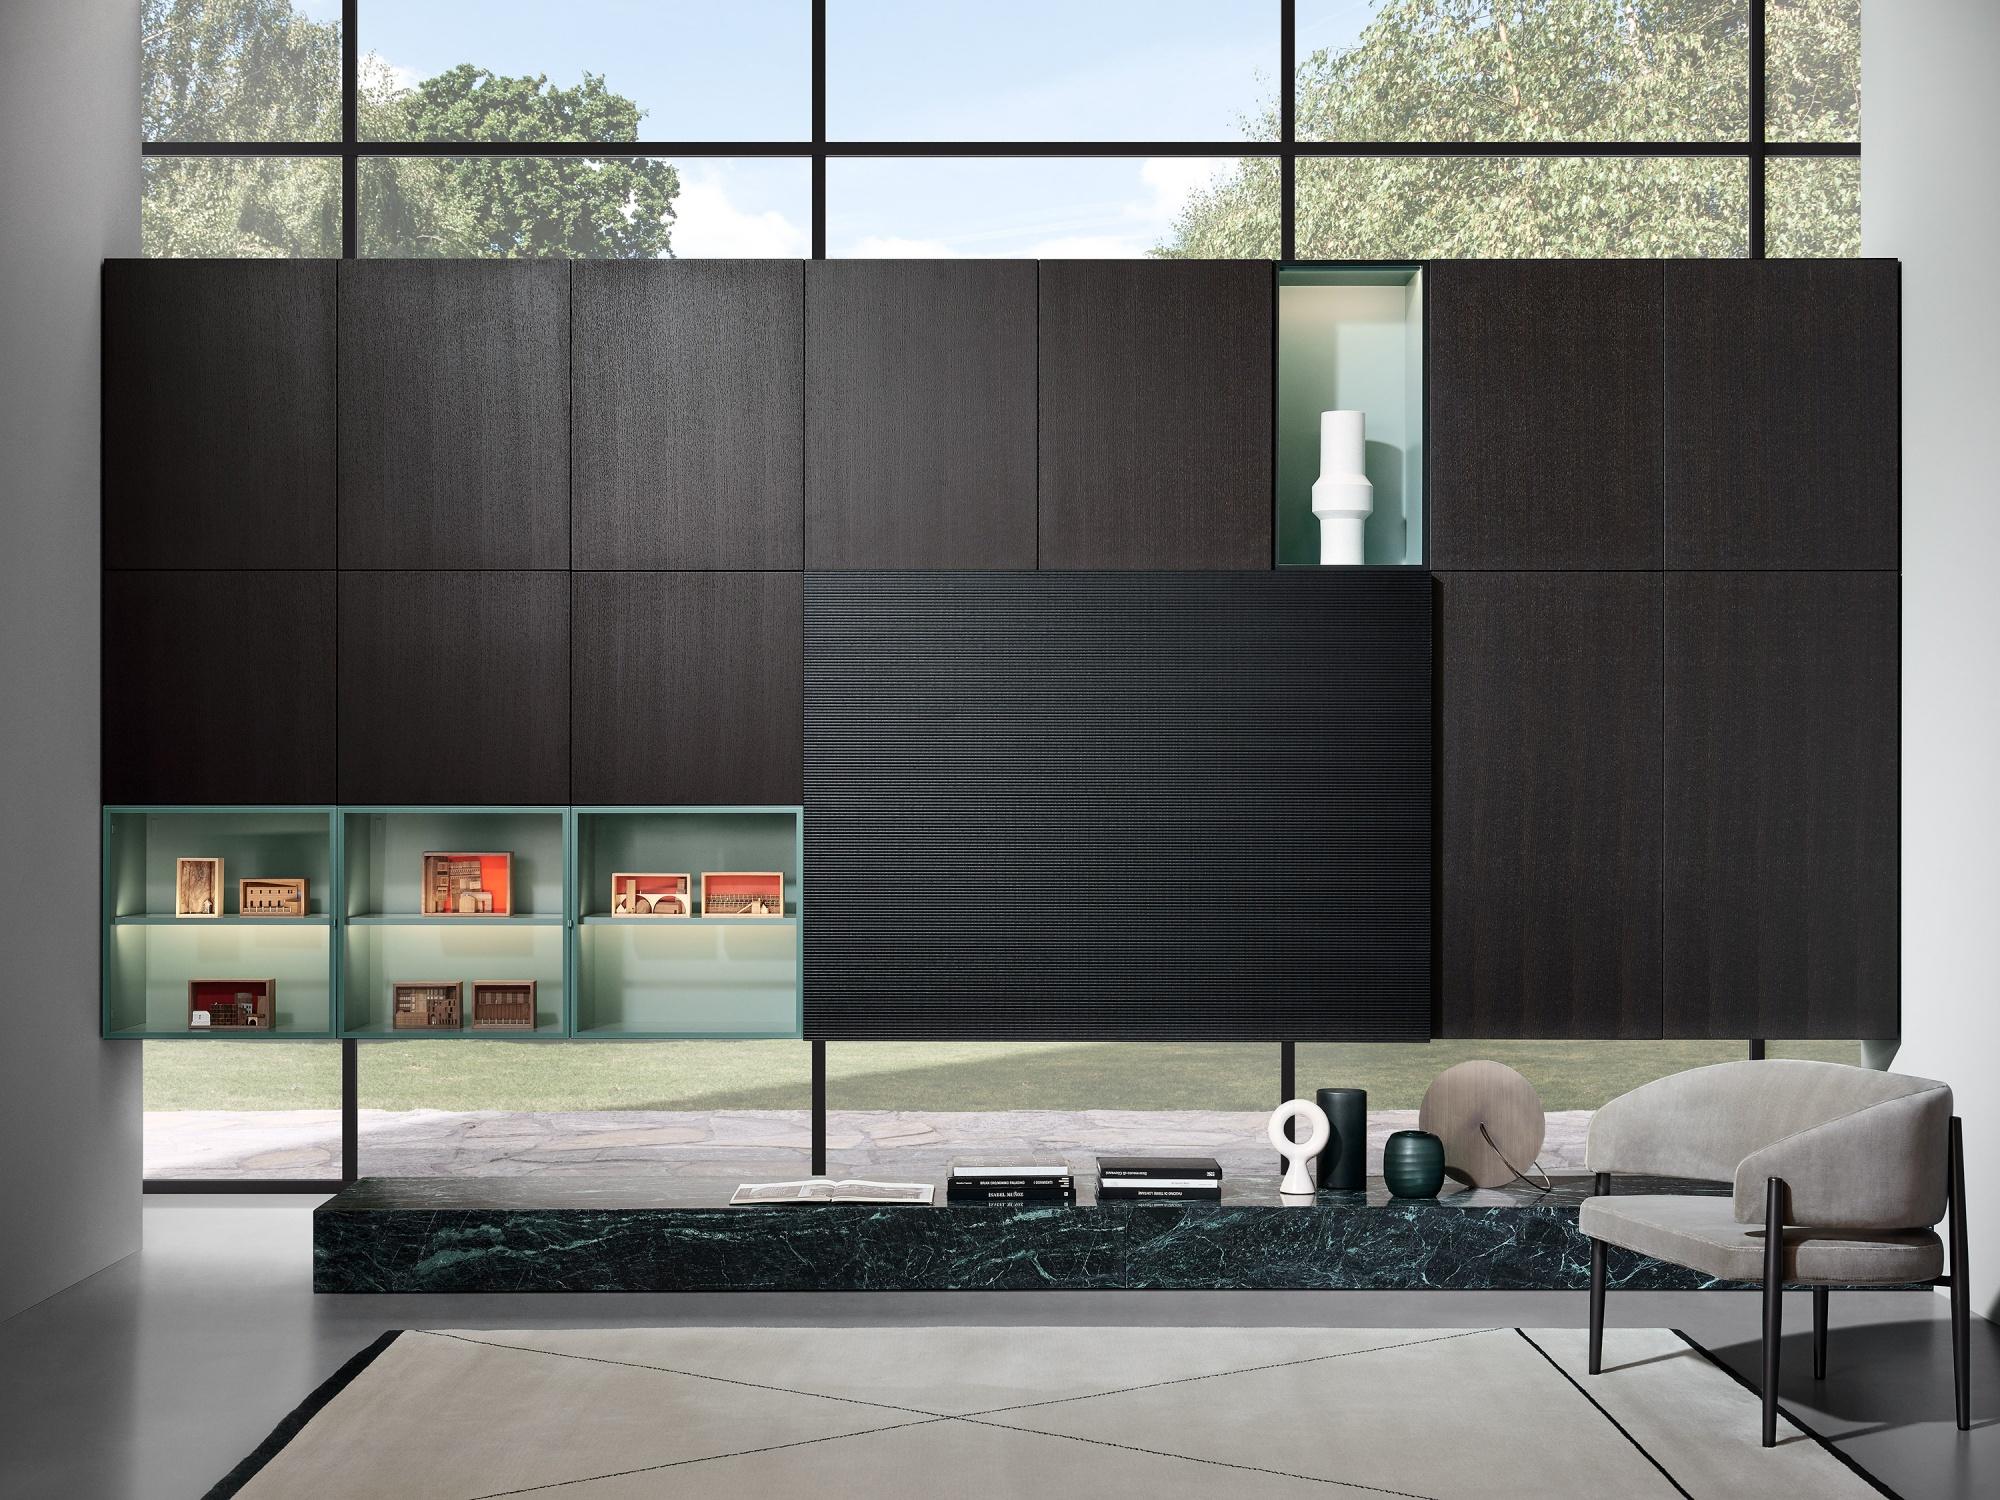 Porro, image:MODERN, designed by: Piero Lissoni + CRS -